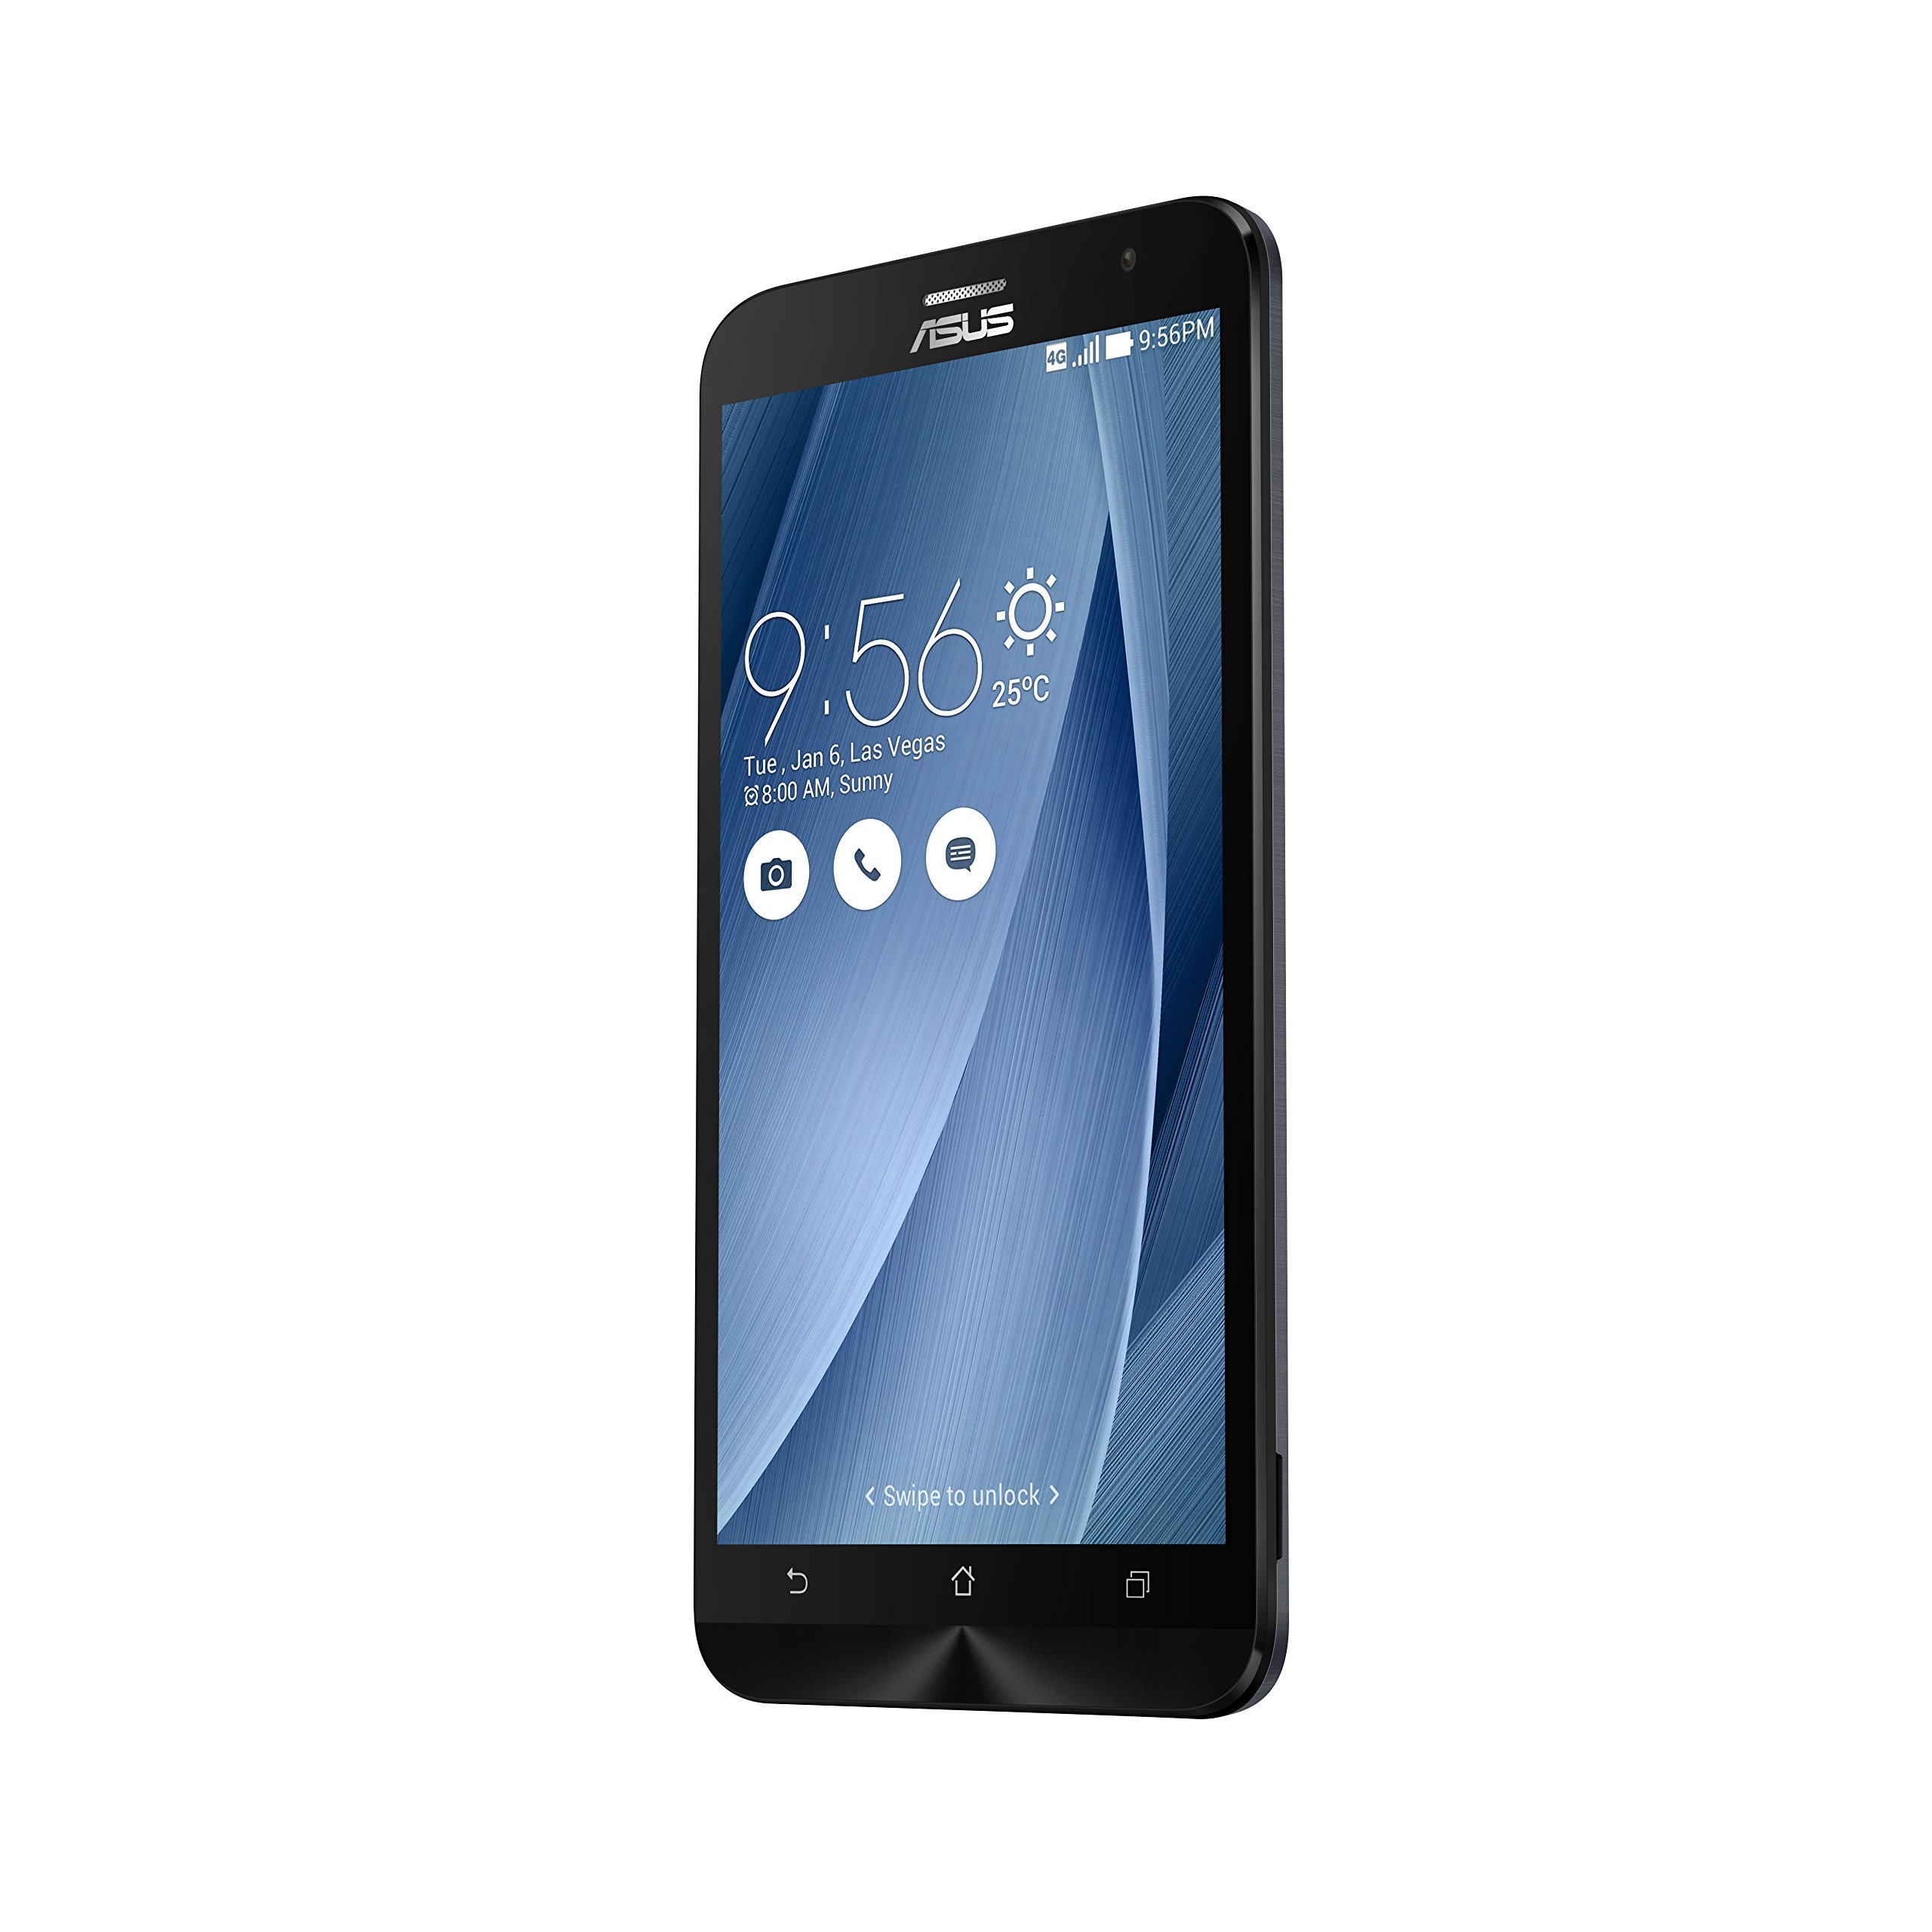 Asus Zenfone 2 ZE551ML - Smartphone Libre Android (Pantalla 5.5 ...